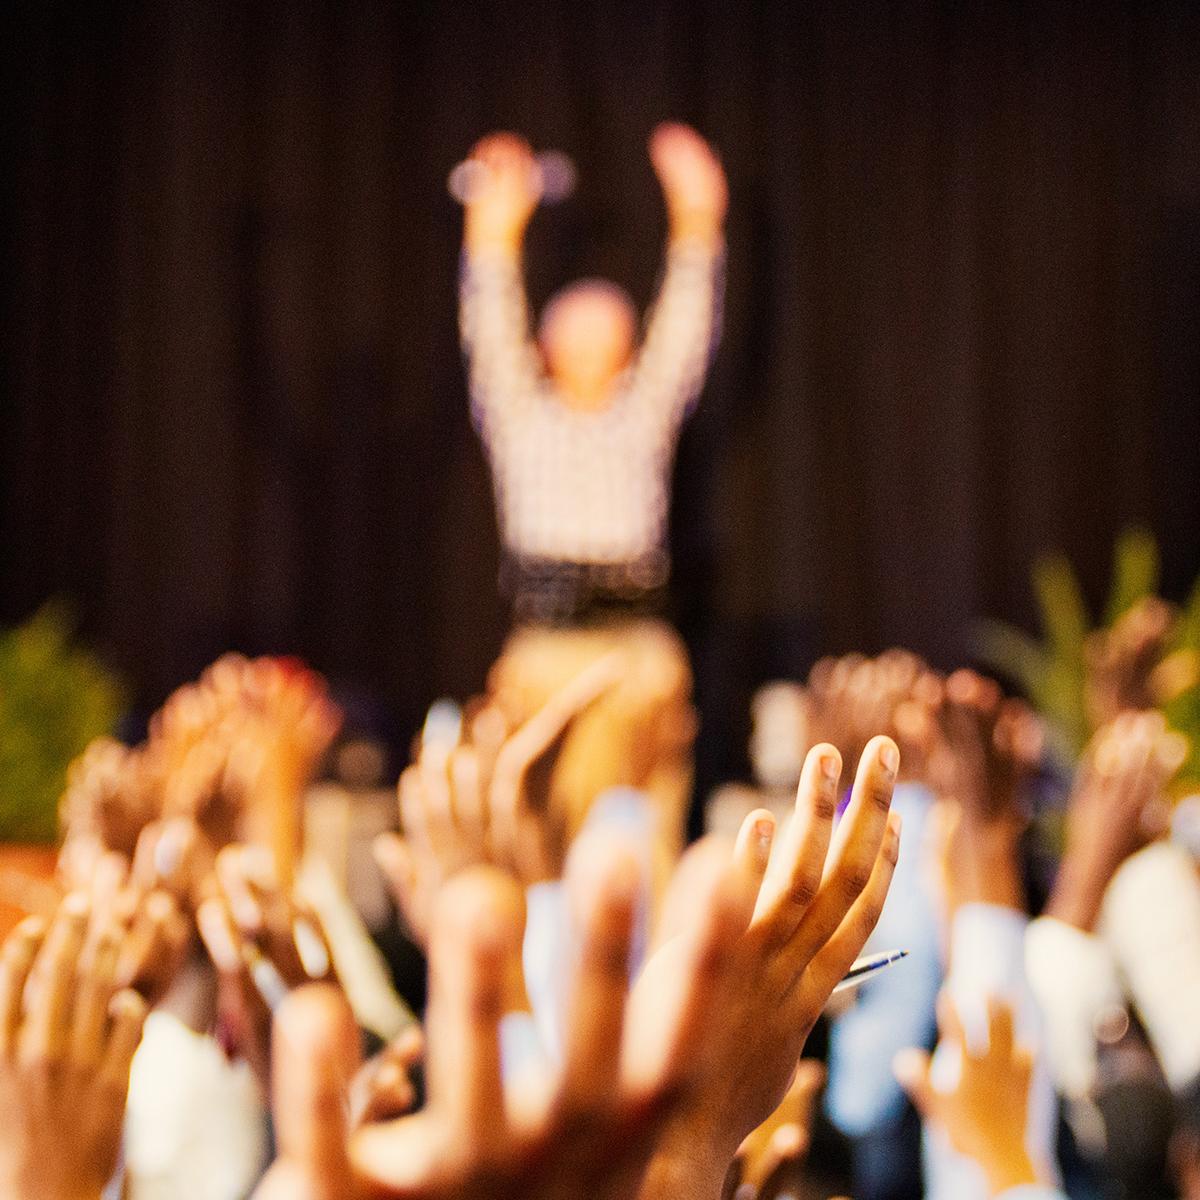 Ecommerce Conferences For Entrepreneurs in 2019